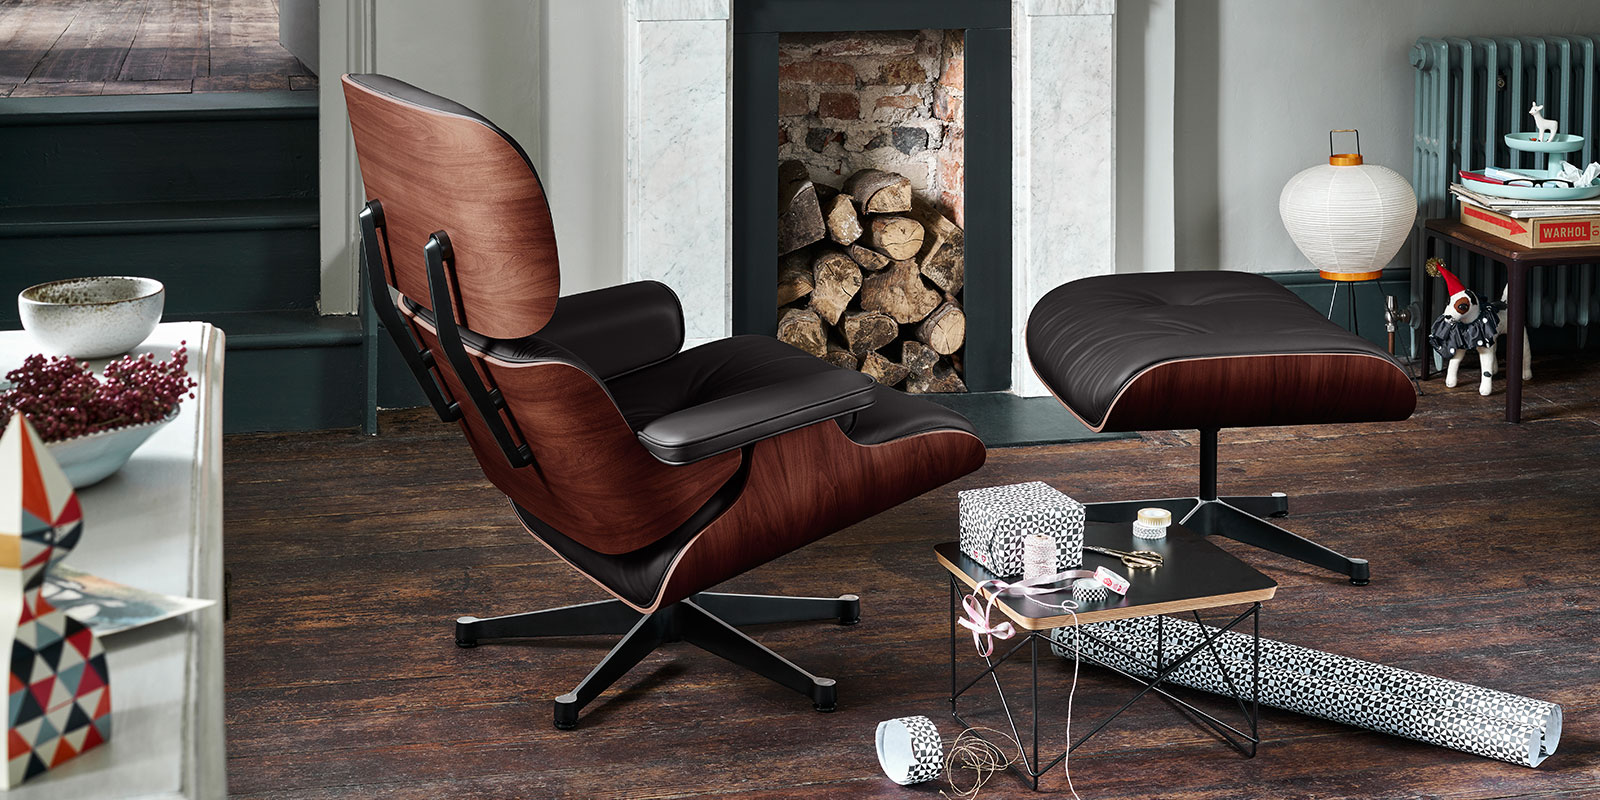 Papillon Interiors Lounge Chairs - Vitra Eames Lounge Chair & Ottoman